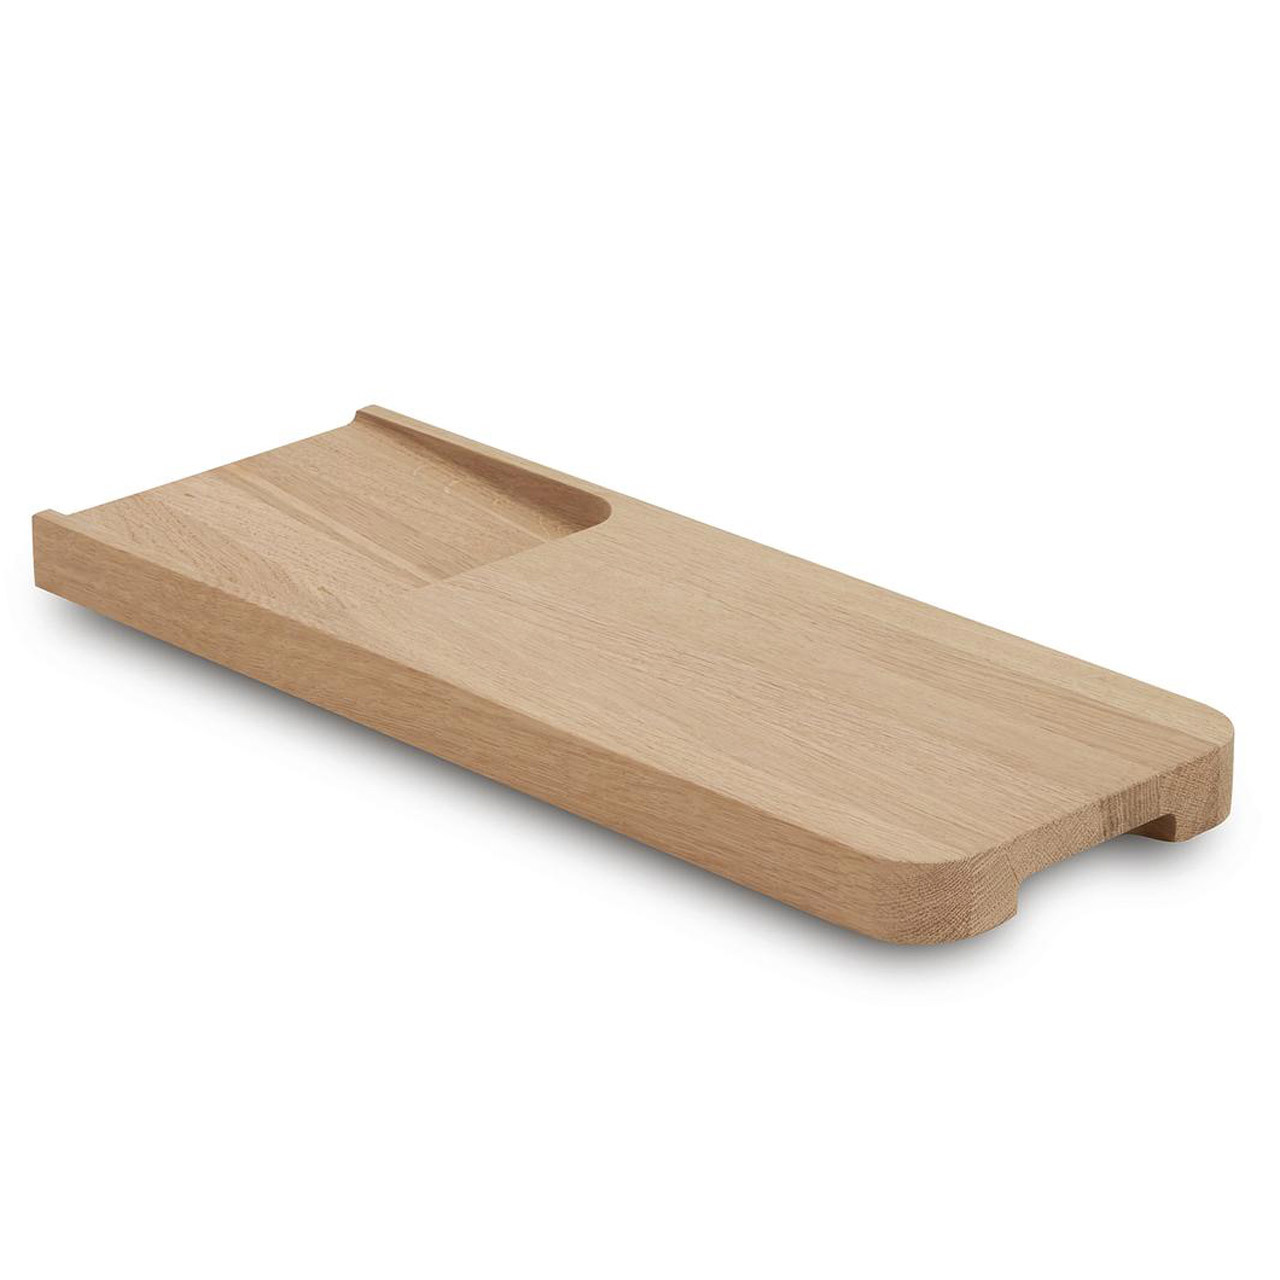 'Chop' Cutting Board